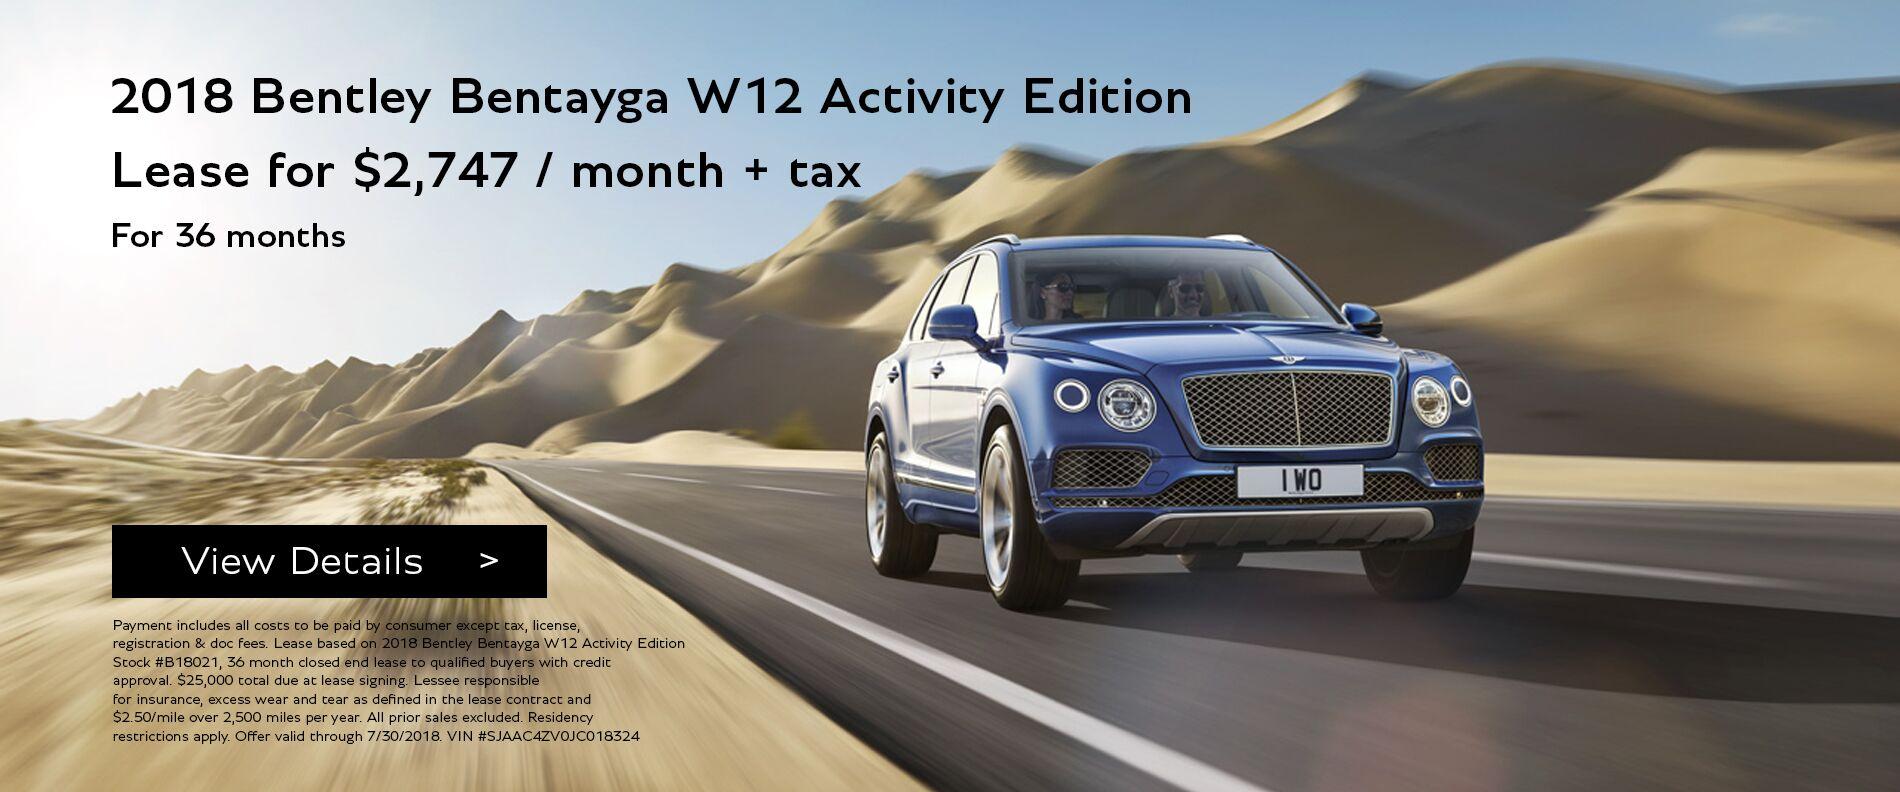 2018 Bentayga Activity Edition